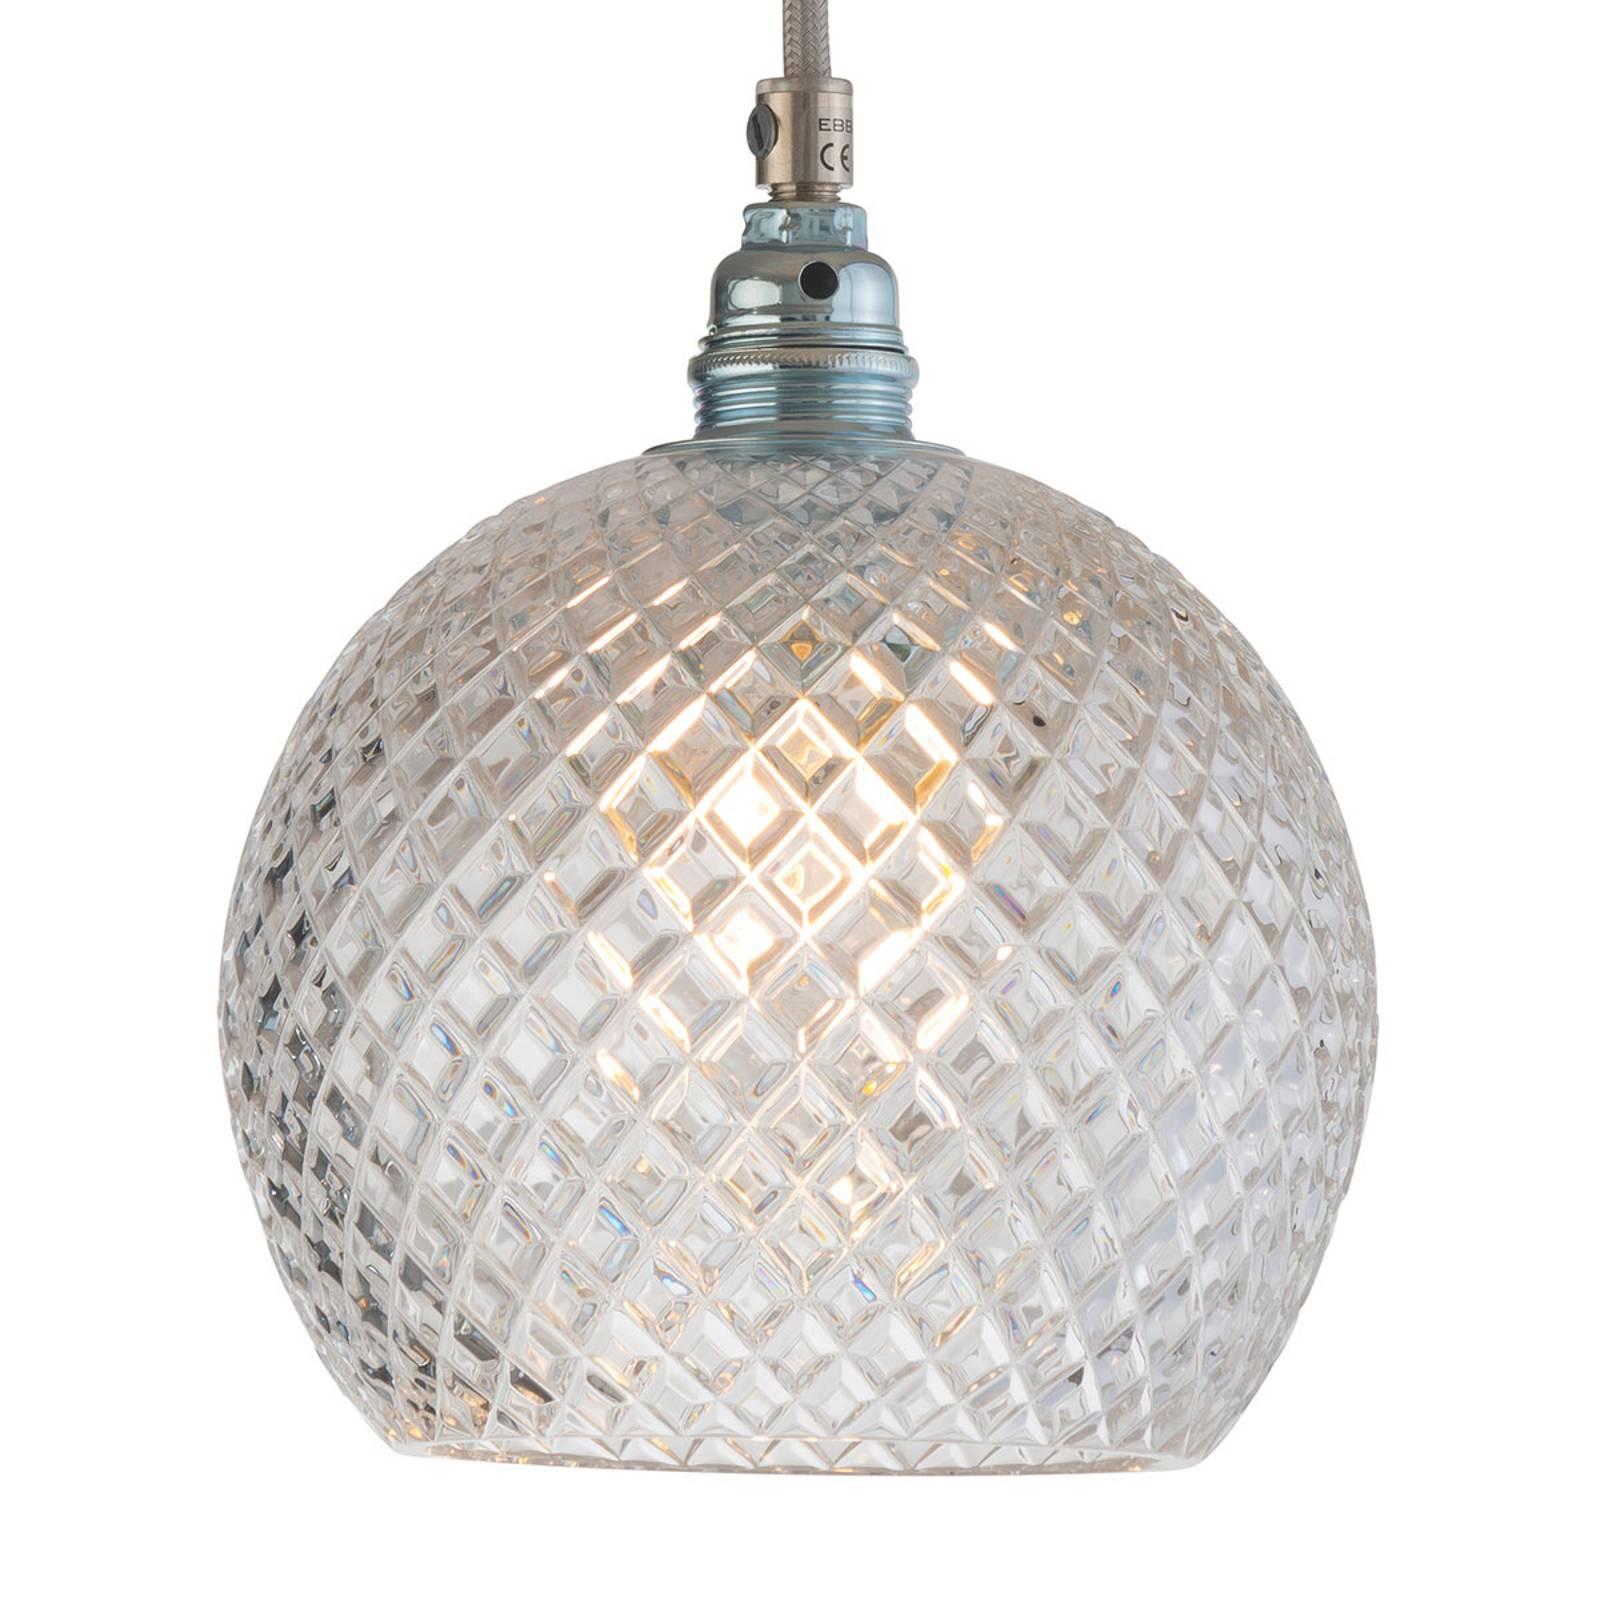 EBB & FLOW Rowan lampa wisząca, srebrna Ø 15,5cm